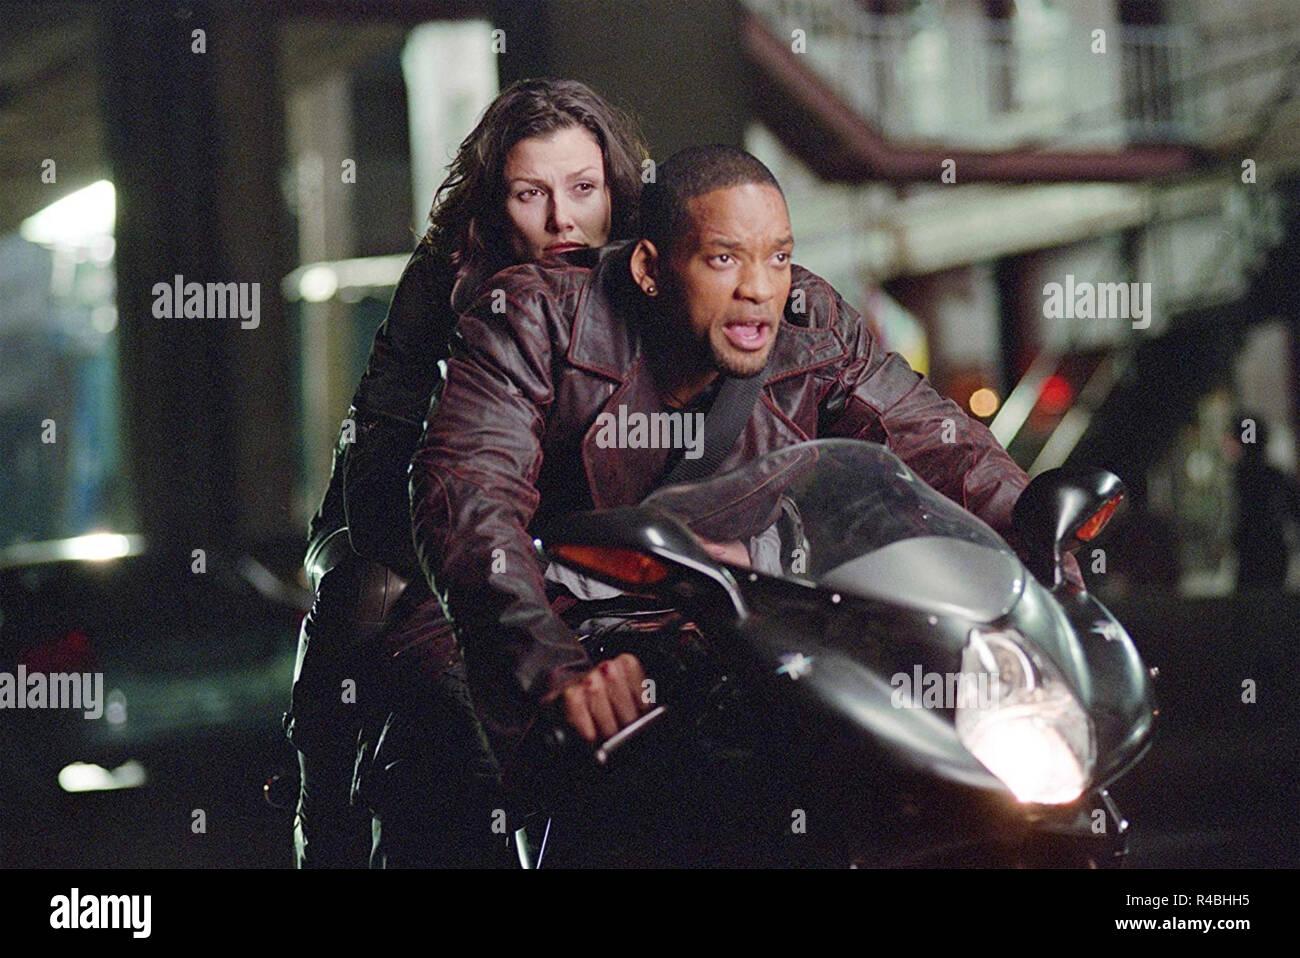 I,ROBOT  2004 Twentieth Century Fox film with Will Smith and Bridget Moynahan - Stock Image